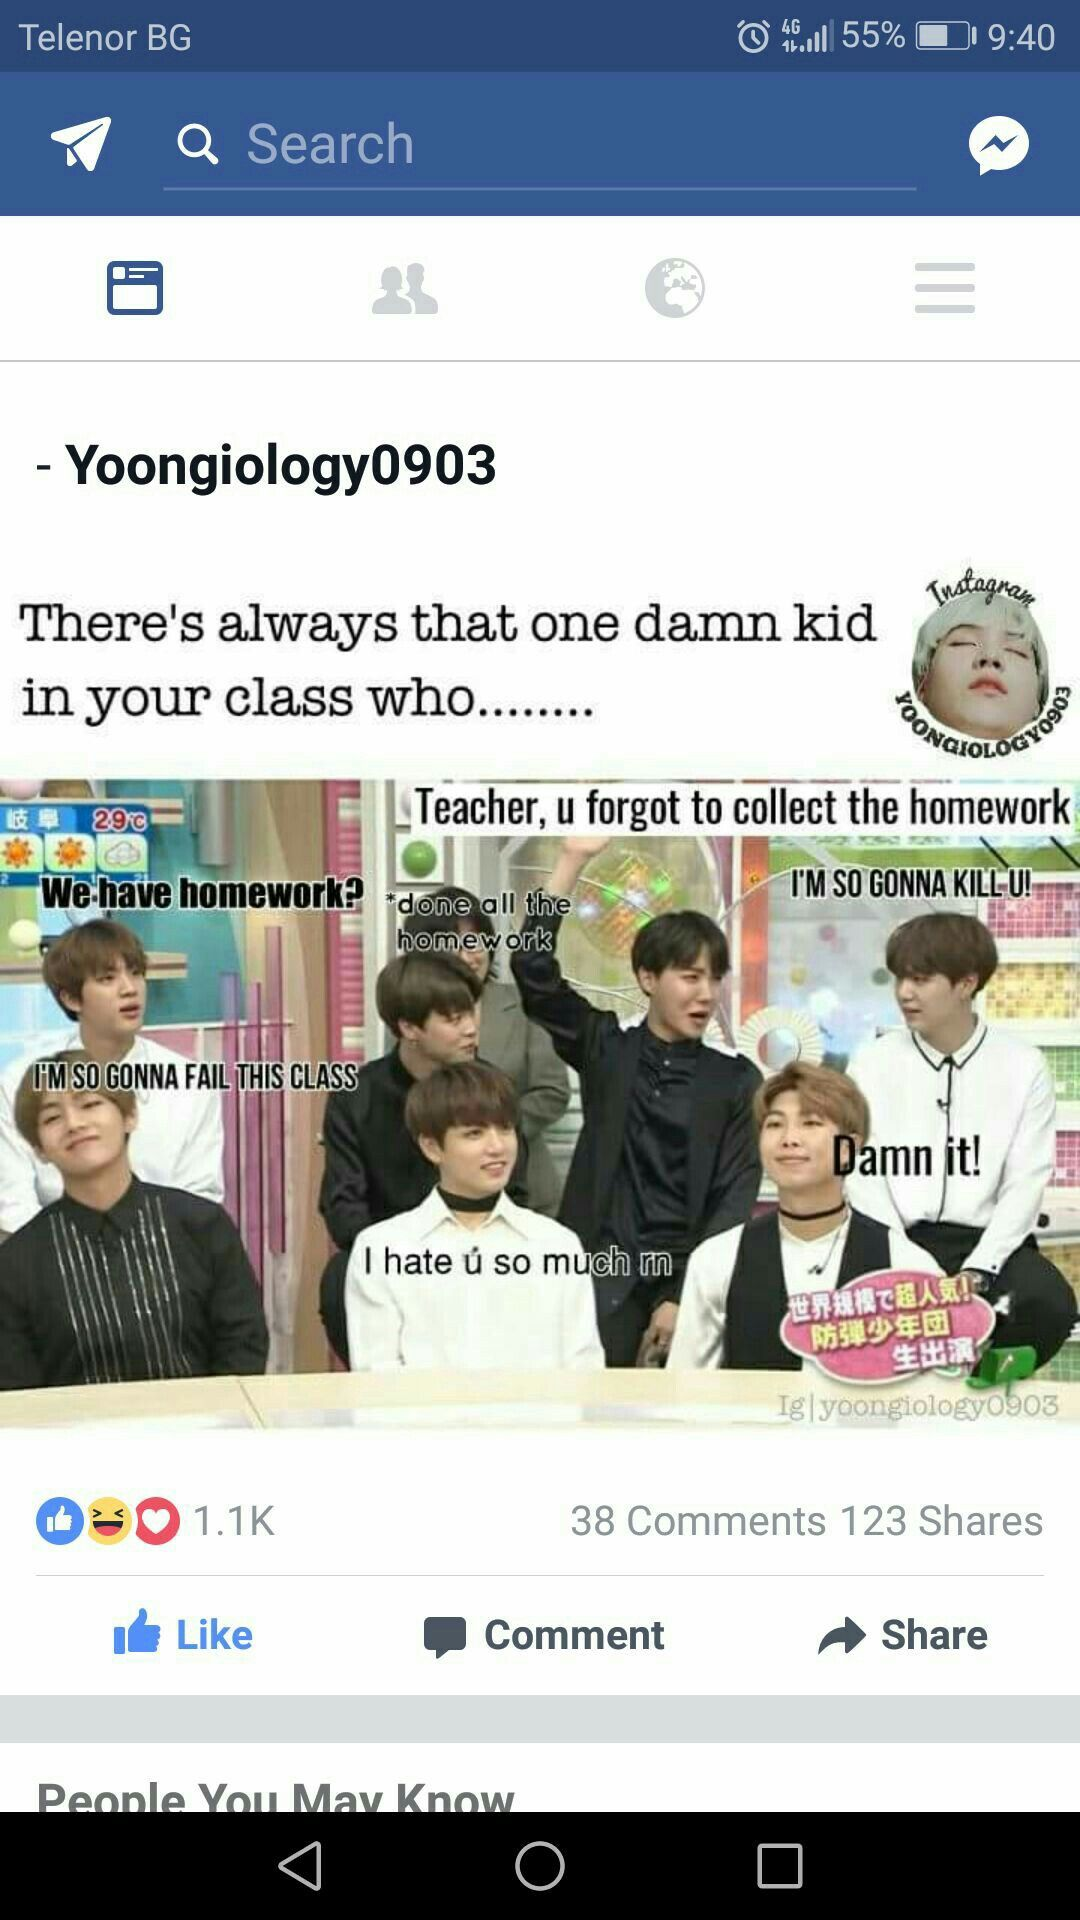 Pin by 𝖏𝖊𝖗𝖎𝖈𝖆 on BTS Memes Bts memes, Bts memes